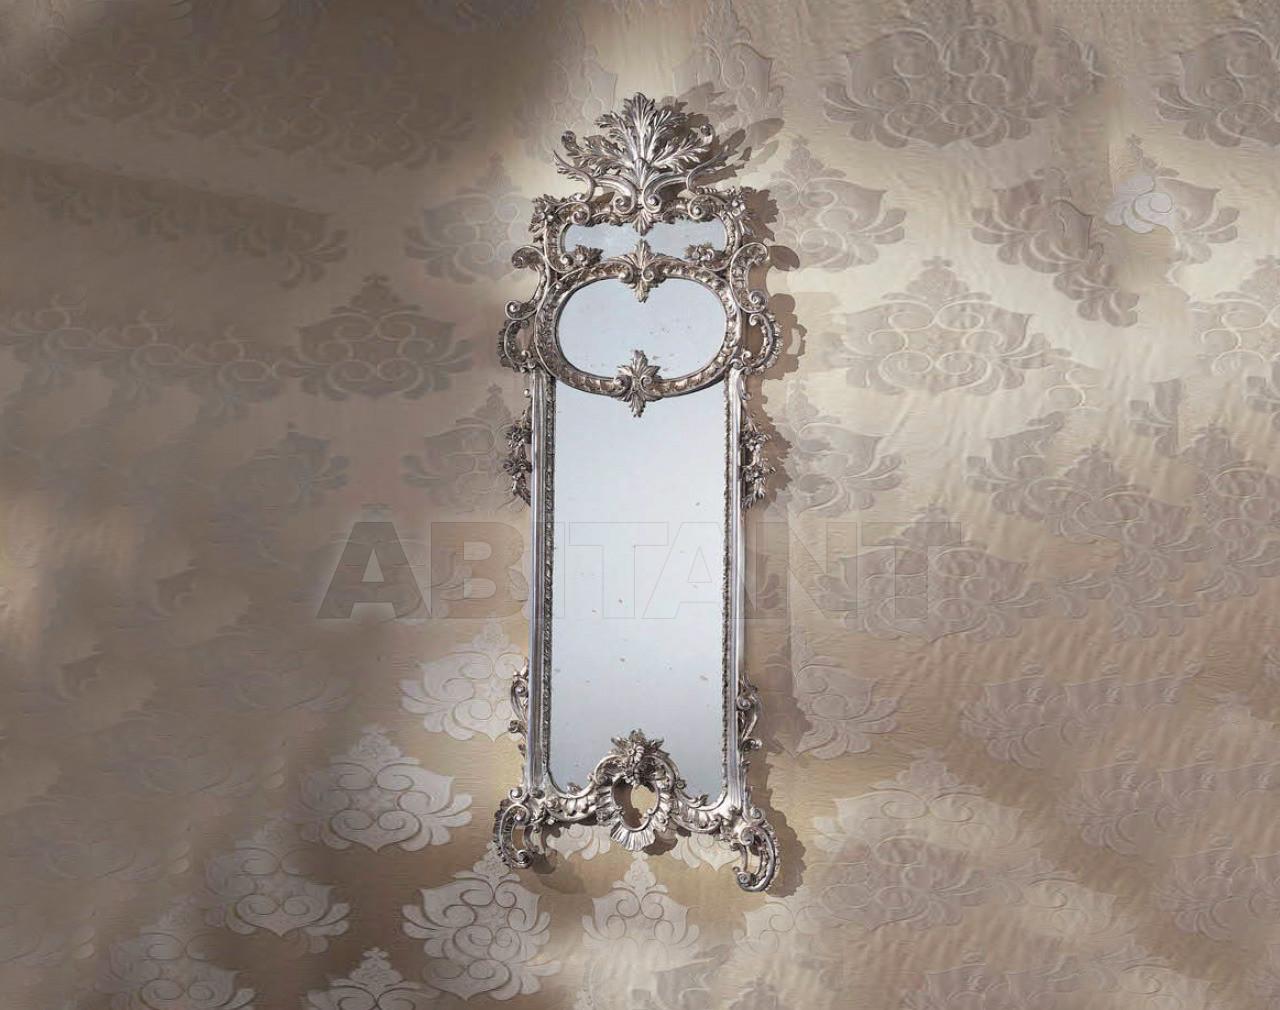 Купить Зеркало настенное Paolo Lucchetta & C. snc Complements MR.014.19